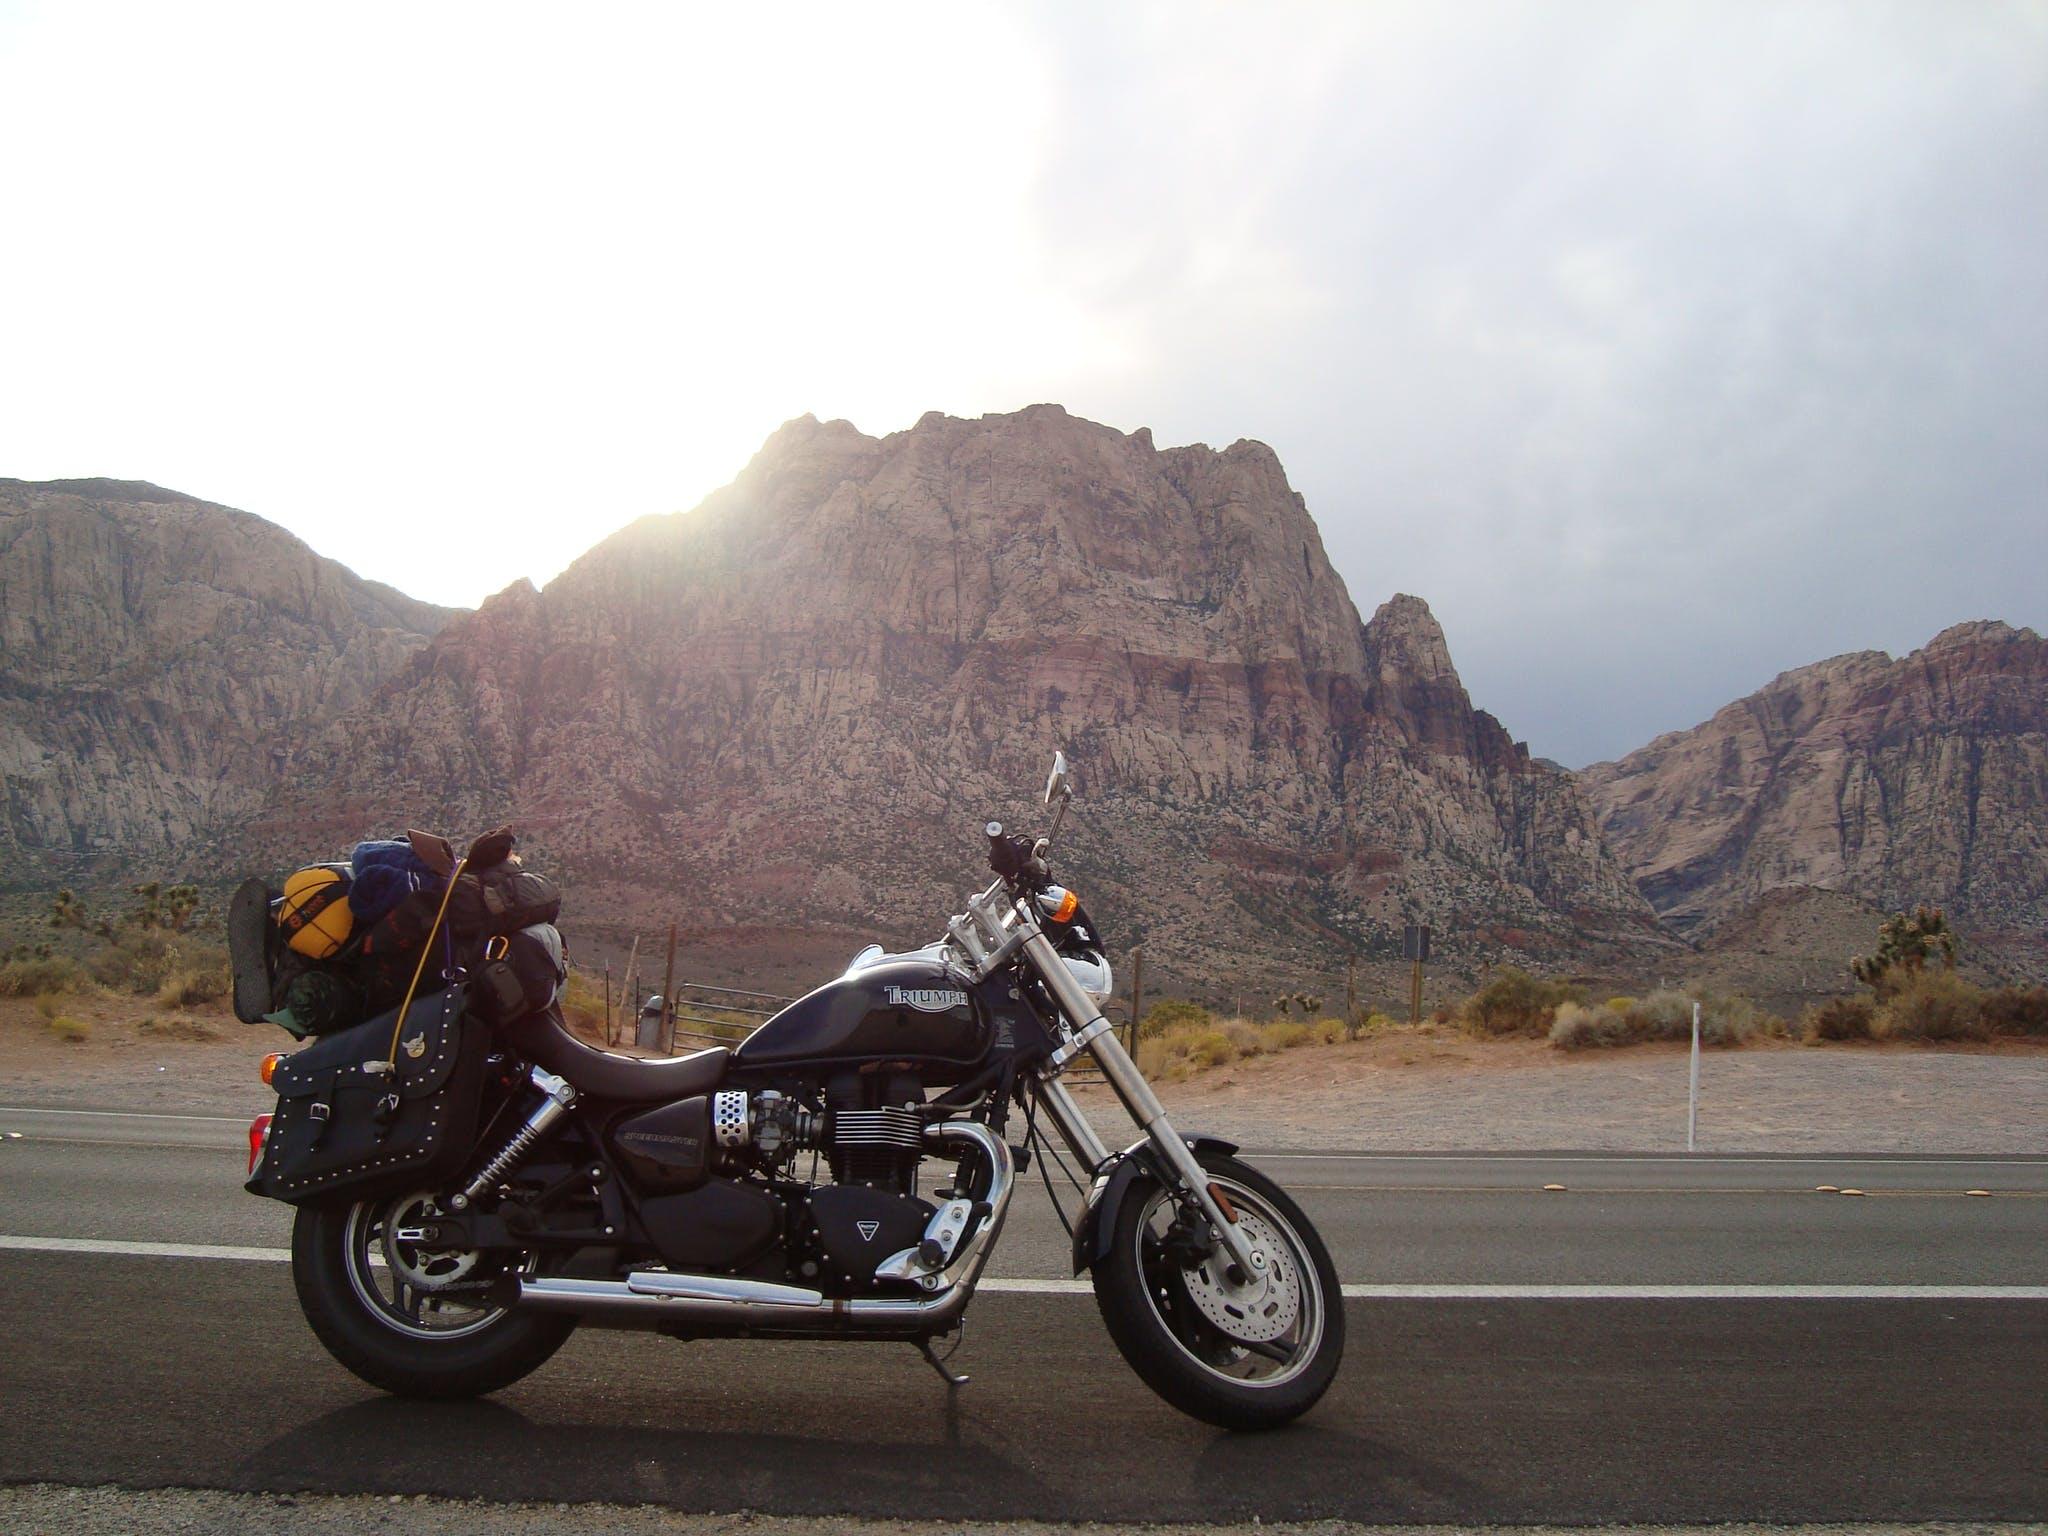 Free stock photo of Joe Leineweber, motorcycle, road trip